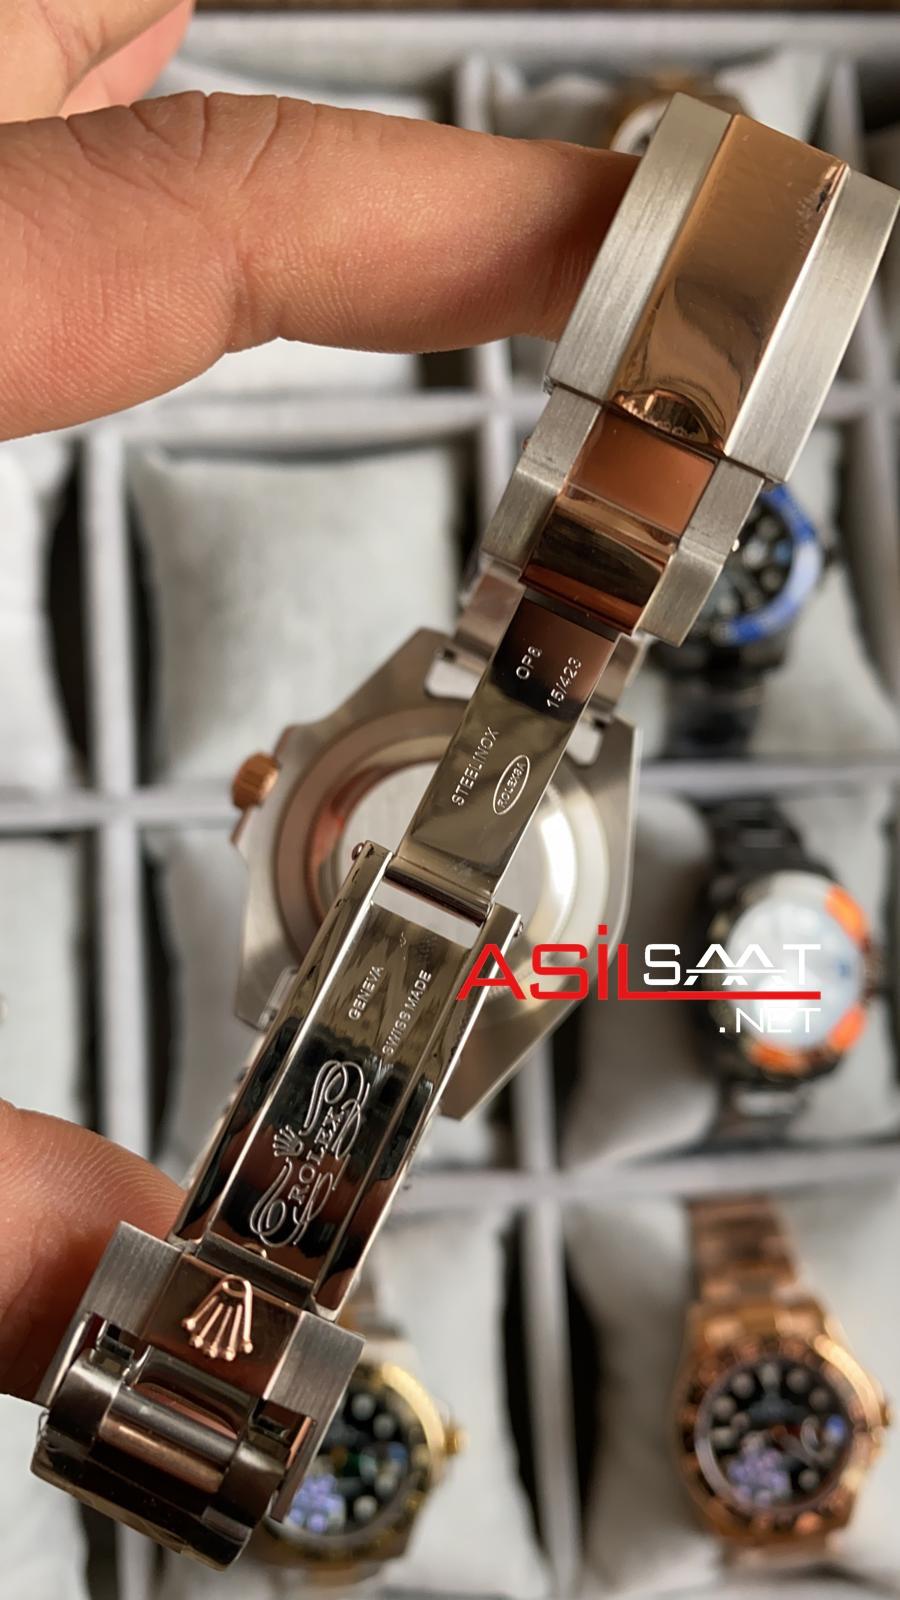 Rolex Oyster Perpetual Gmt Master II Root Beer Two Tone Replika Saat ROLG016